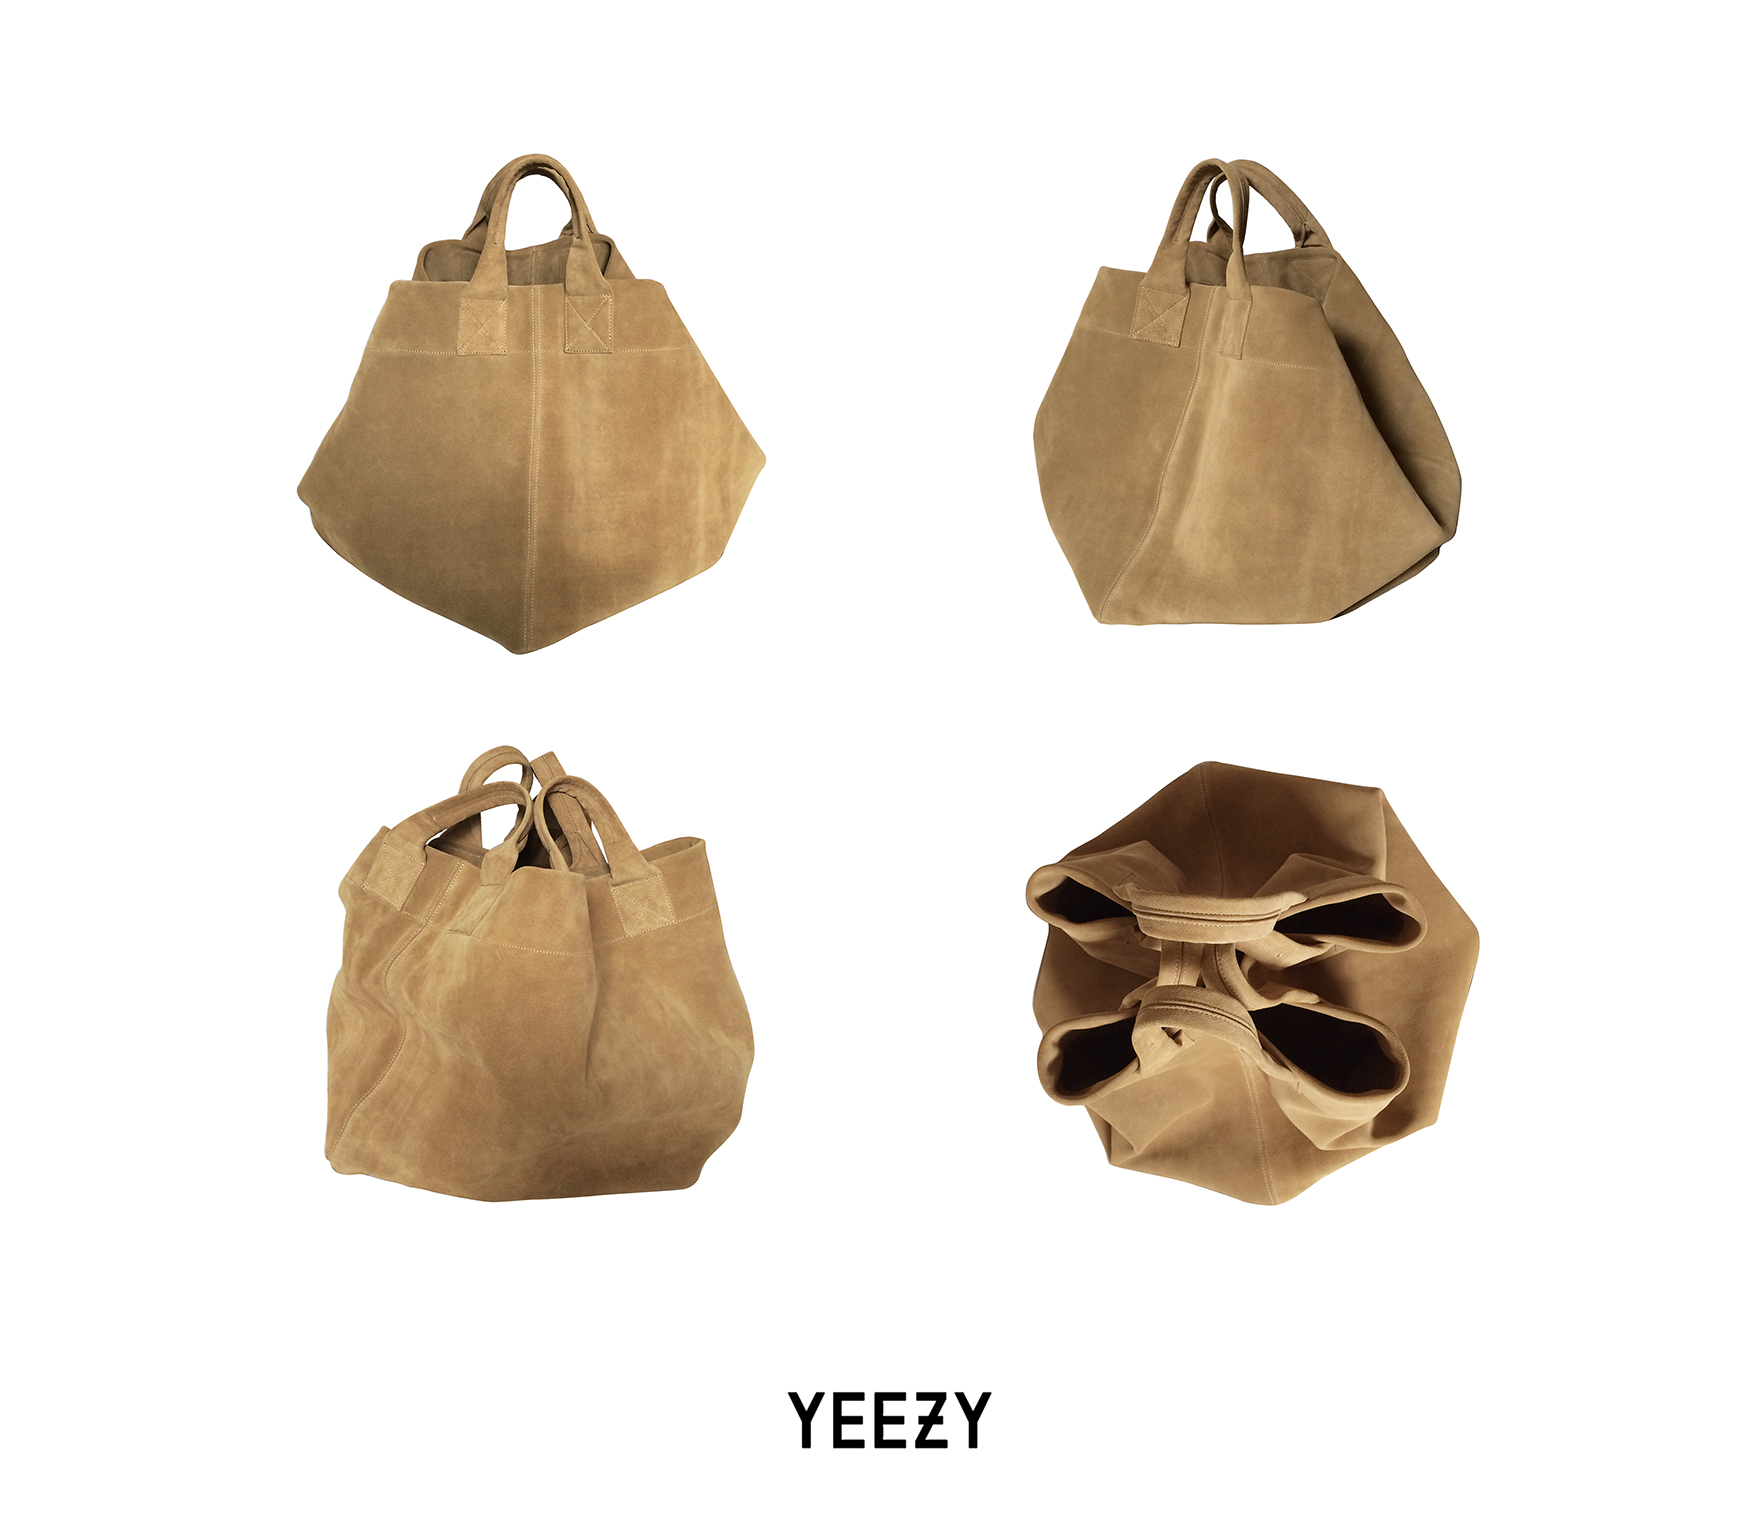 YEEZY Dumpling Bag (Sand)